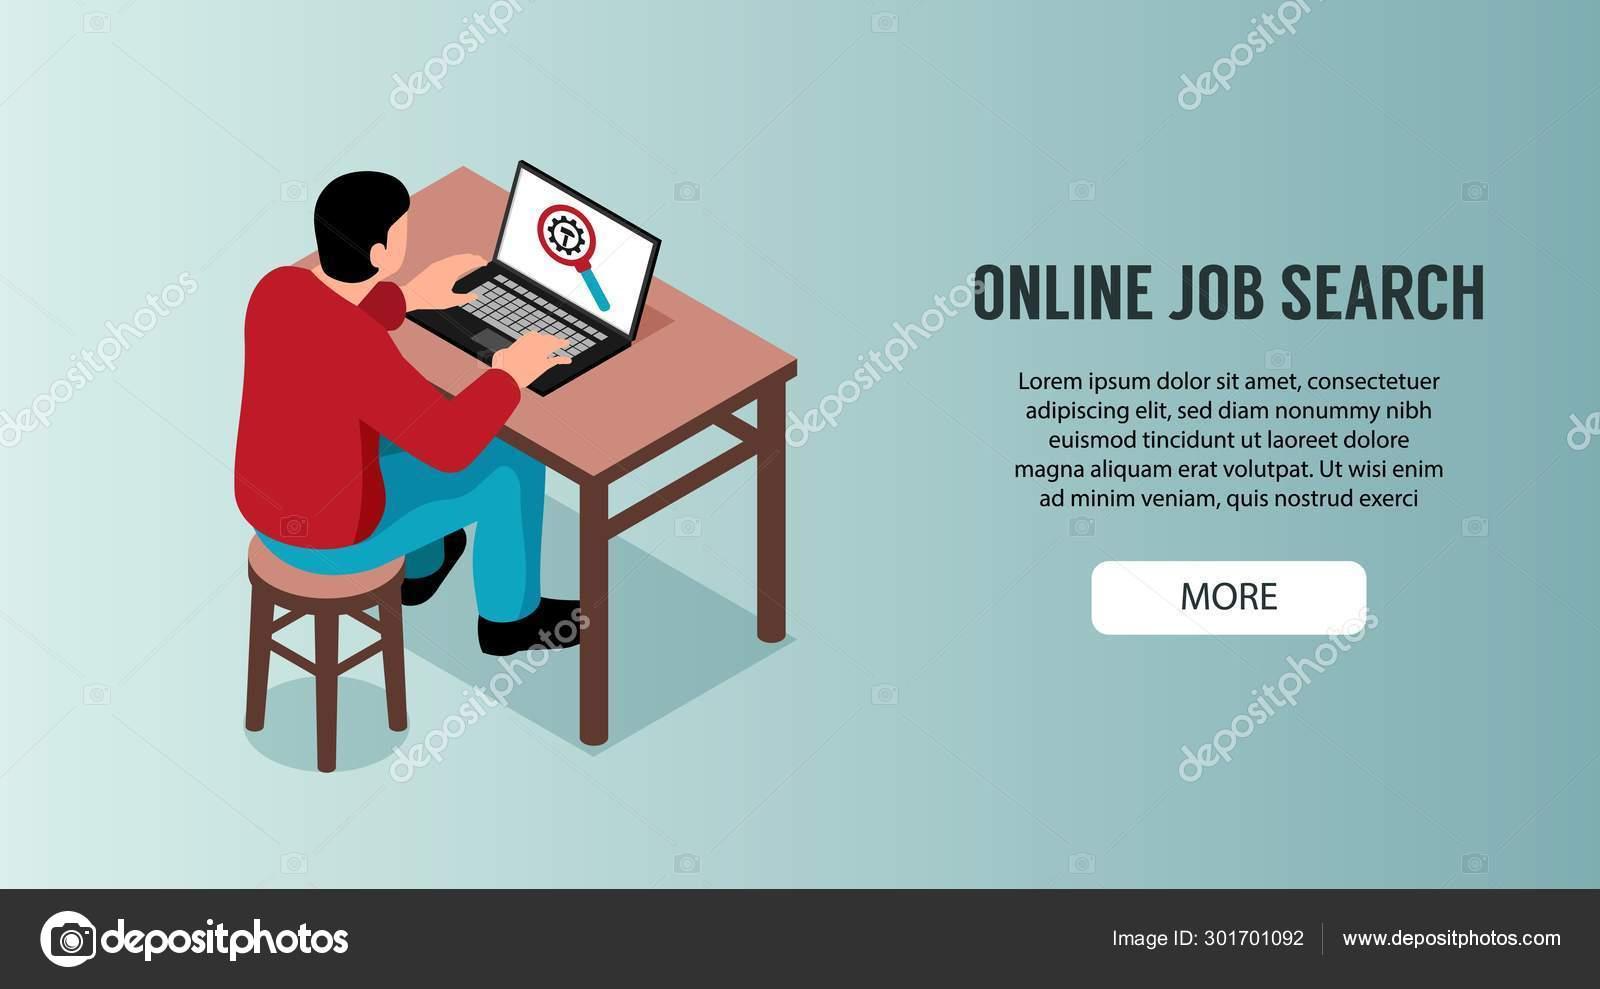 Online Job Search >> Online Job Search Horizontal Banner Stock Vector